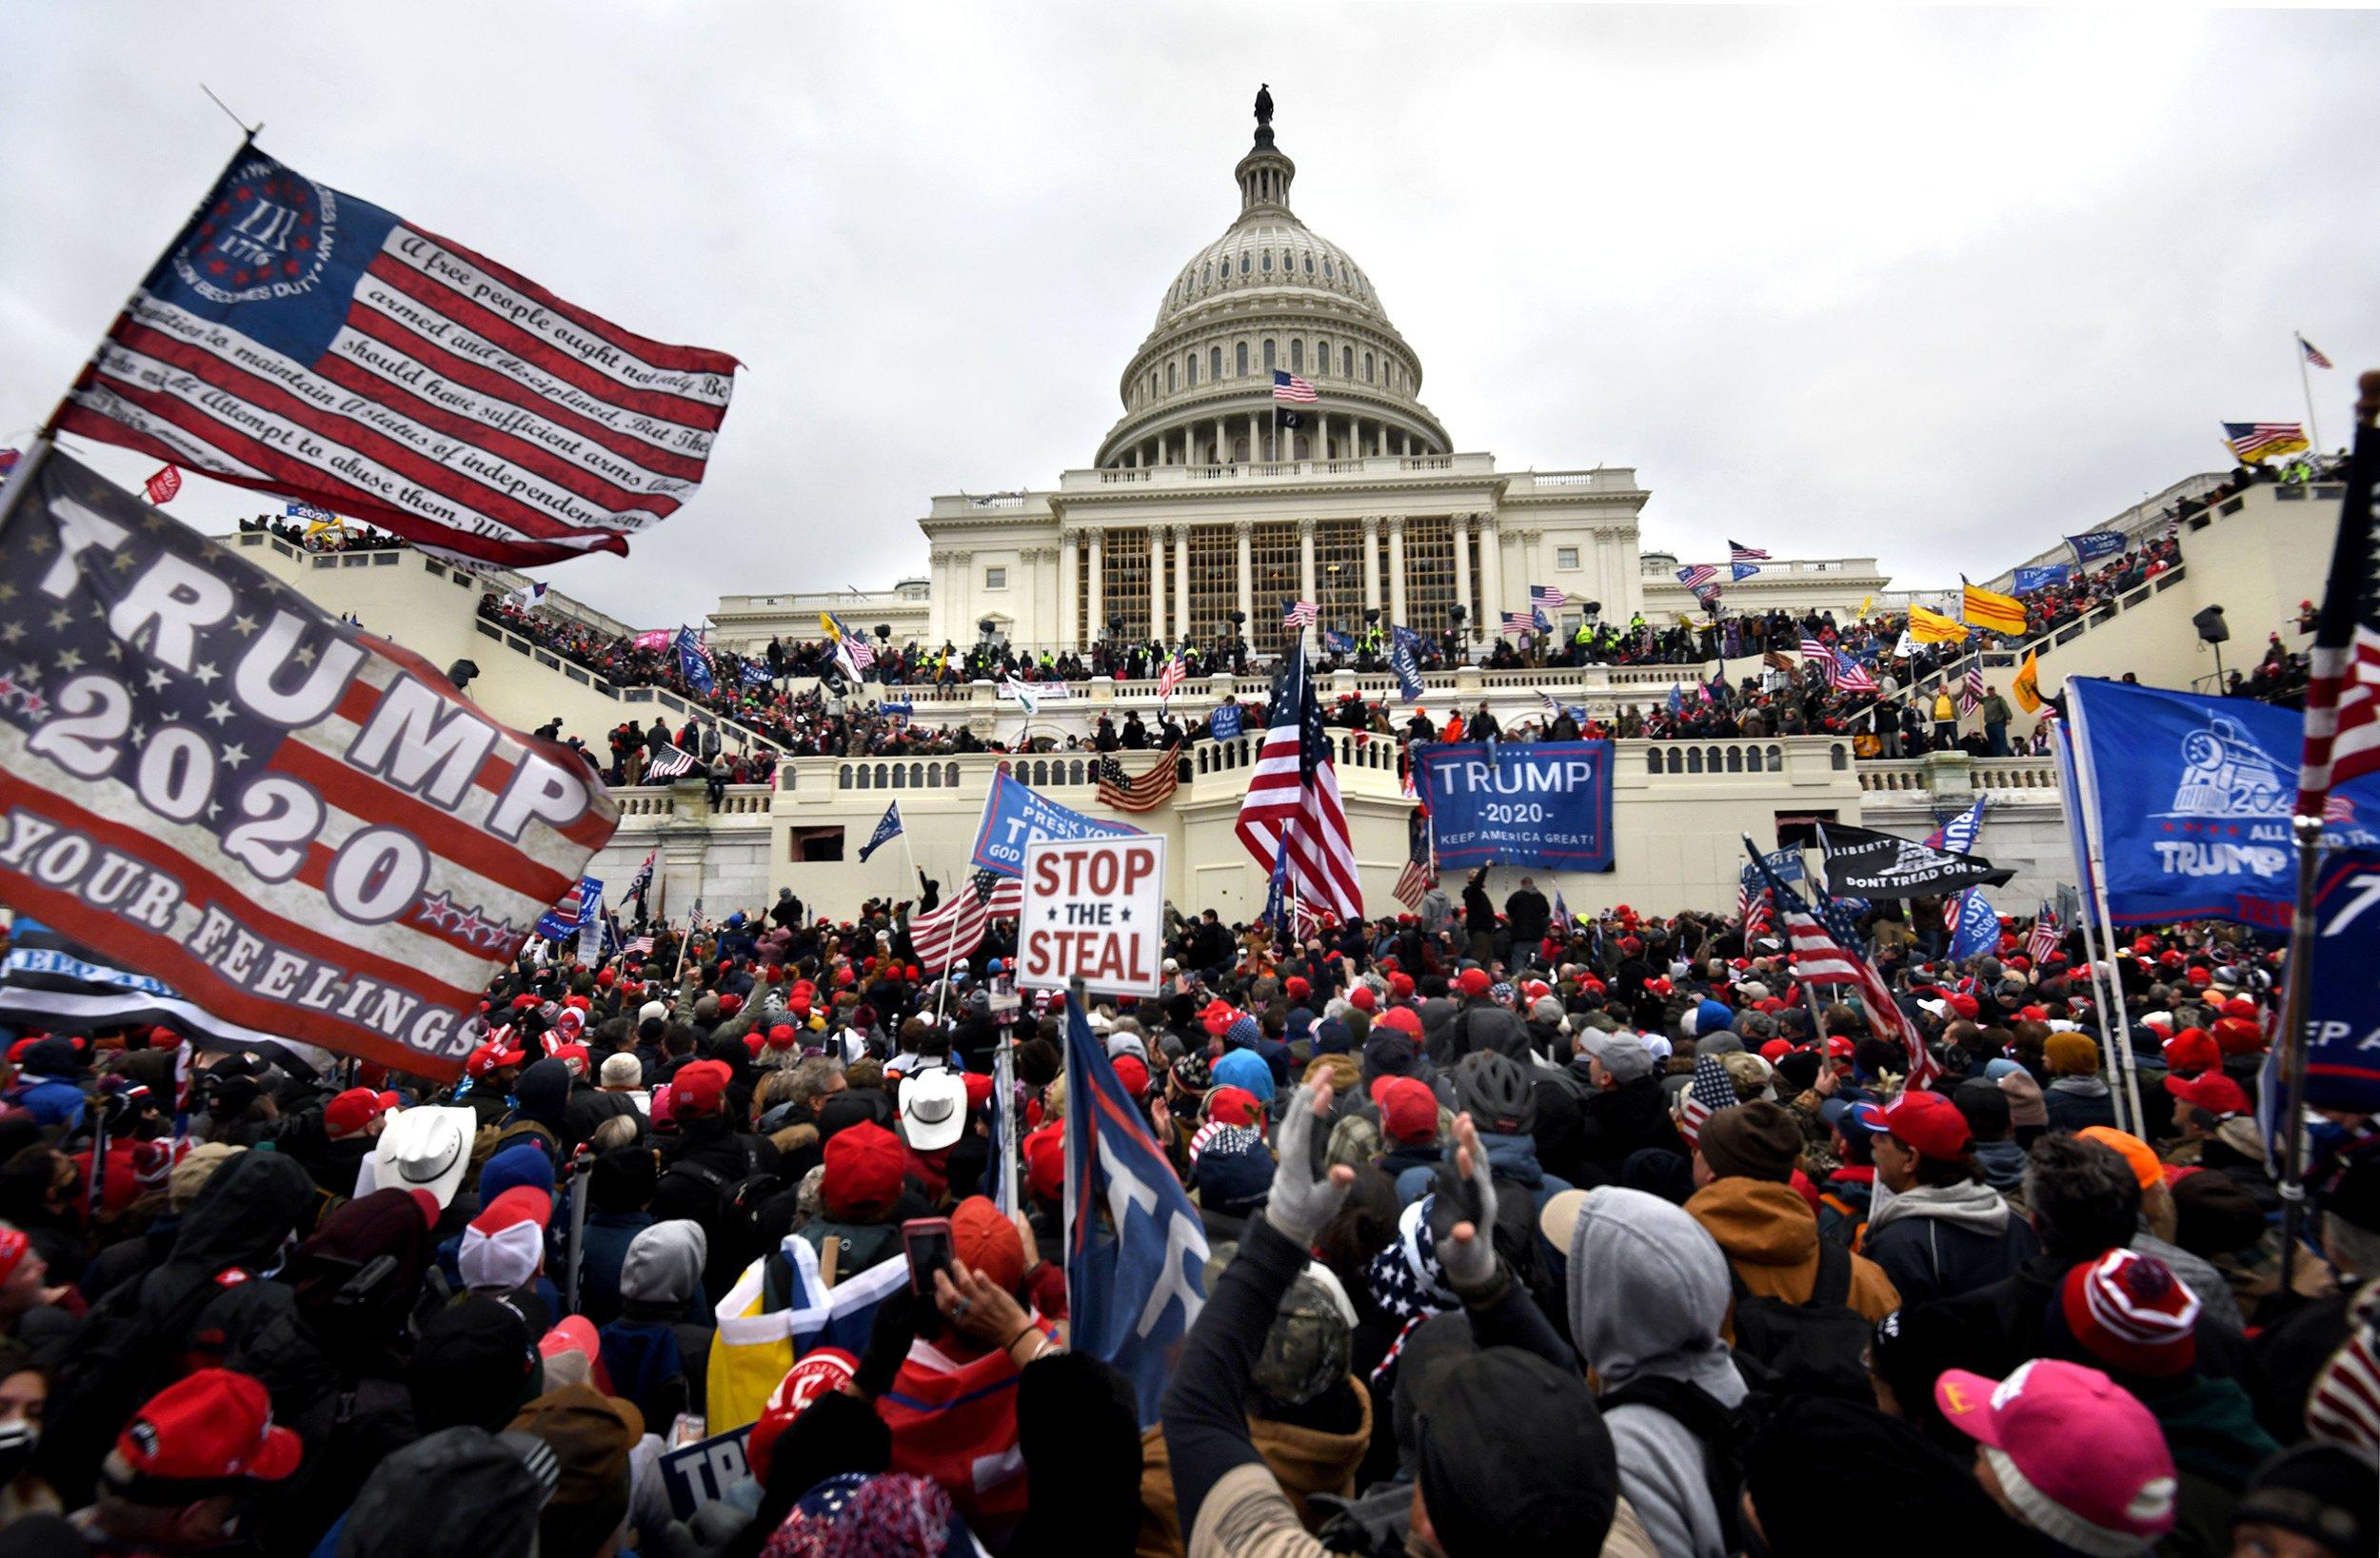 210107-washington-rally-riot-protest-capitol-ONE-TIME-USE-ac-507p_7188ea4cb5294111e6578dc5b7018b0b